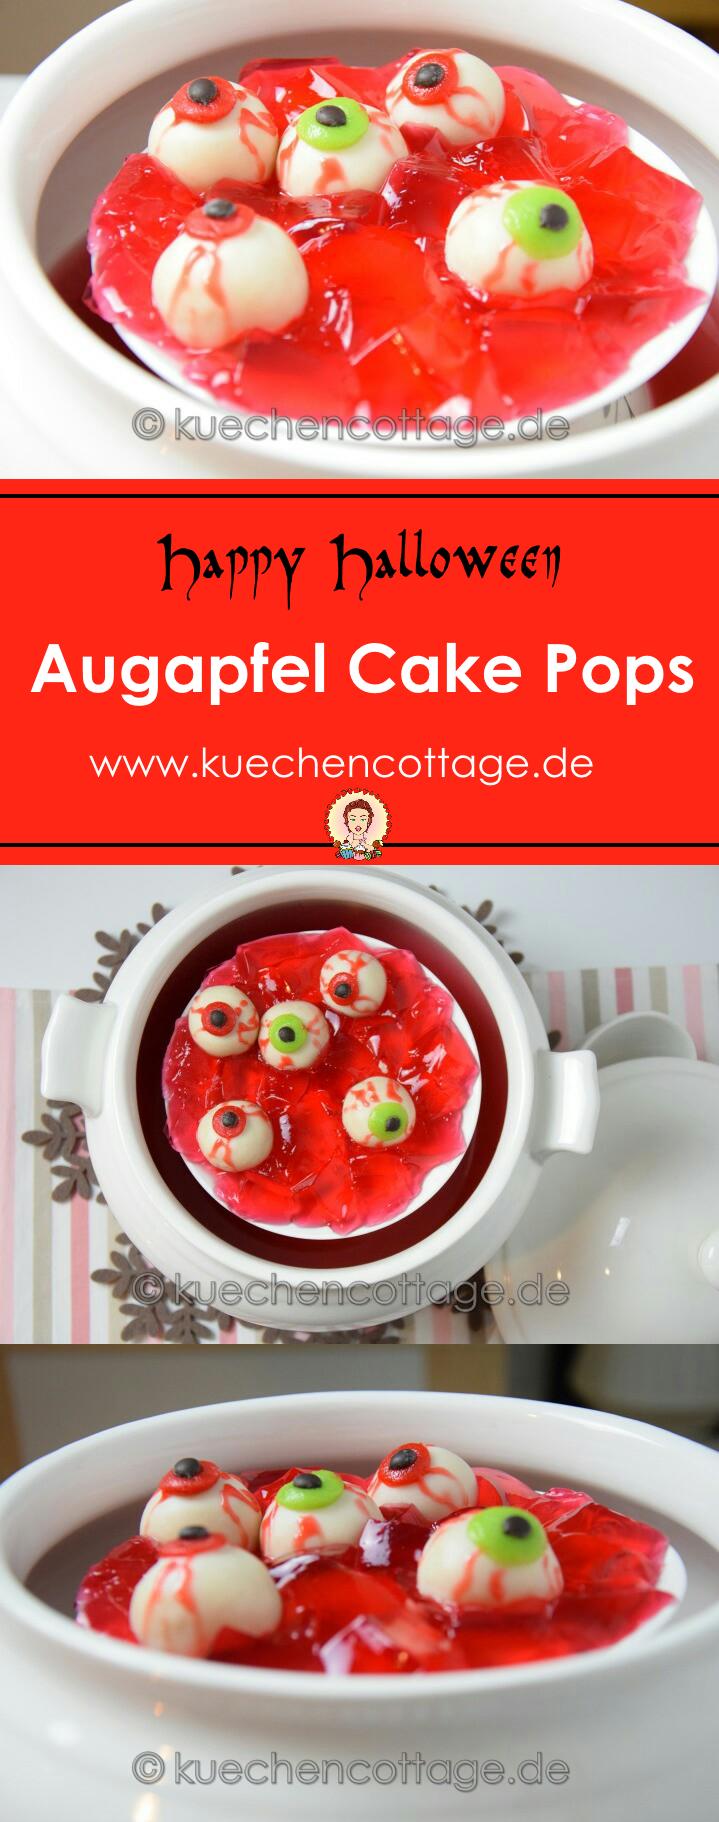 Augapfel-Cakepops | Küchencottage  http://kuechencottage.de/augapfel-cakepops/  Das Rezept für die schaurigen Augapfel-Cakepops findest du auf kuechencottage.de. Happy Halloween!  #Halloween #cakepops #partyfood #rezeptideen #foodporn #foodblog #rezept #backen #partysnacks #süßes #schaurig #gruselig